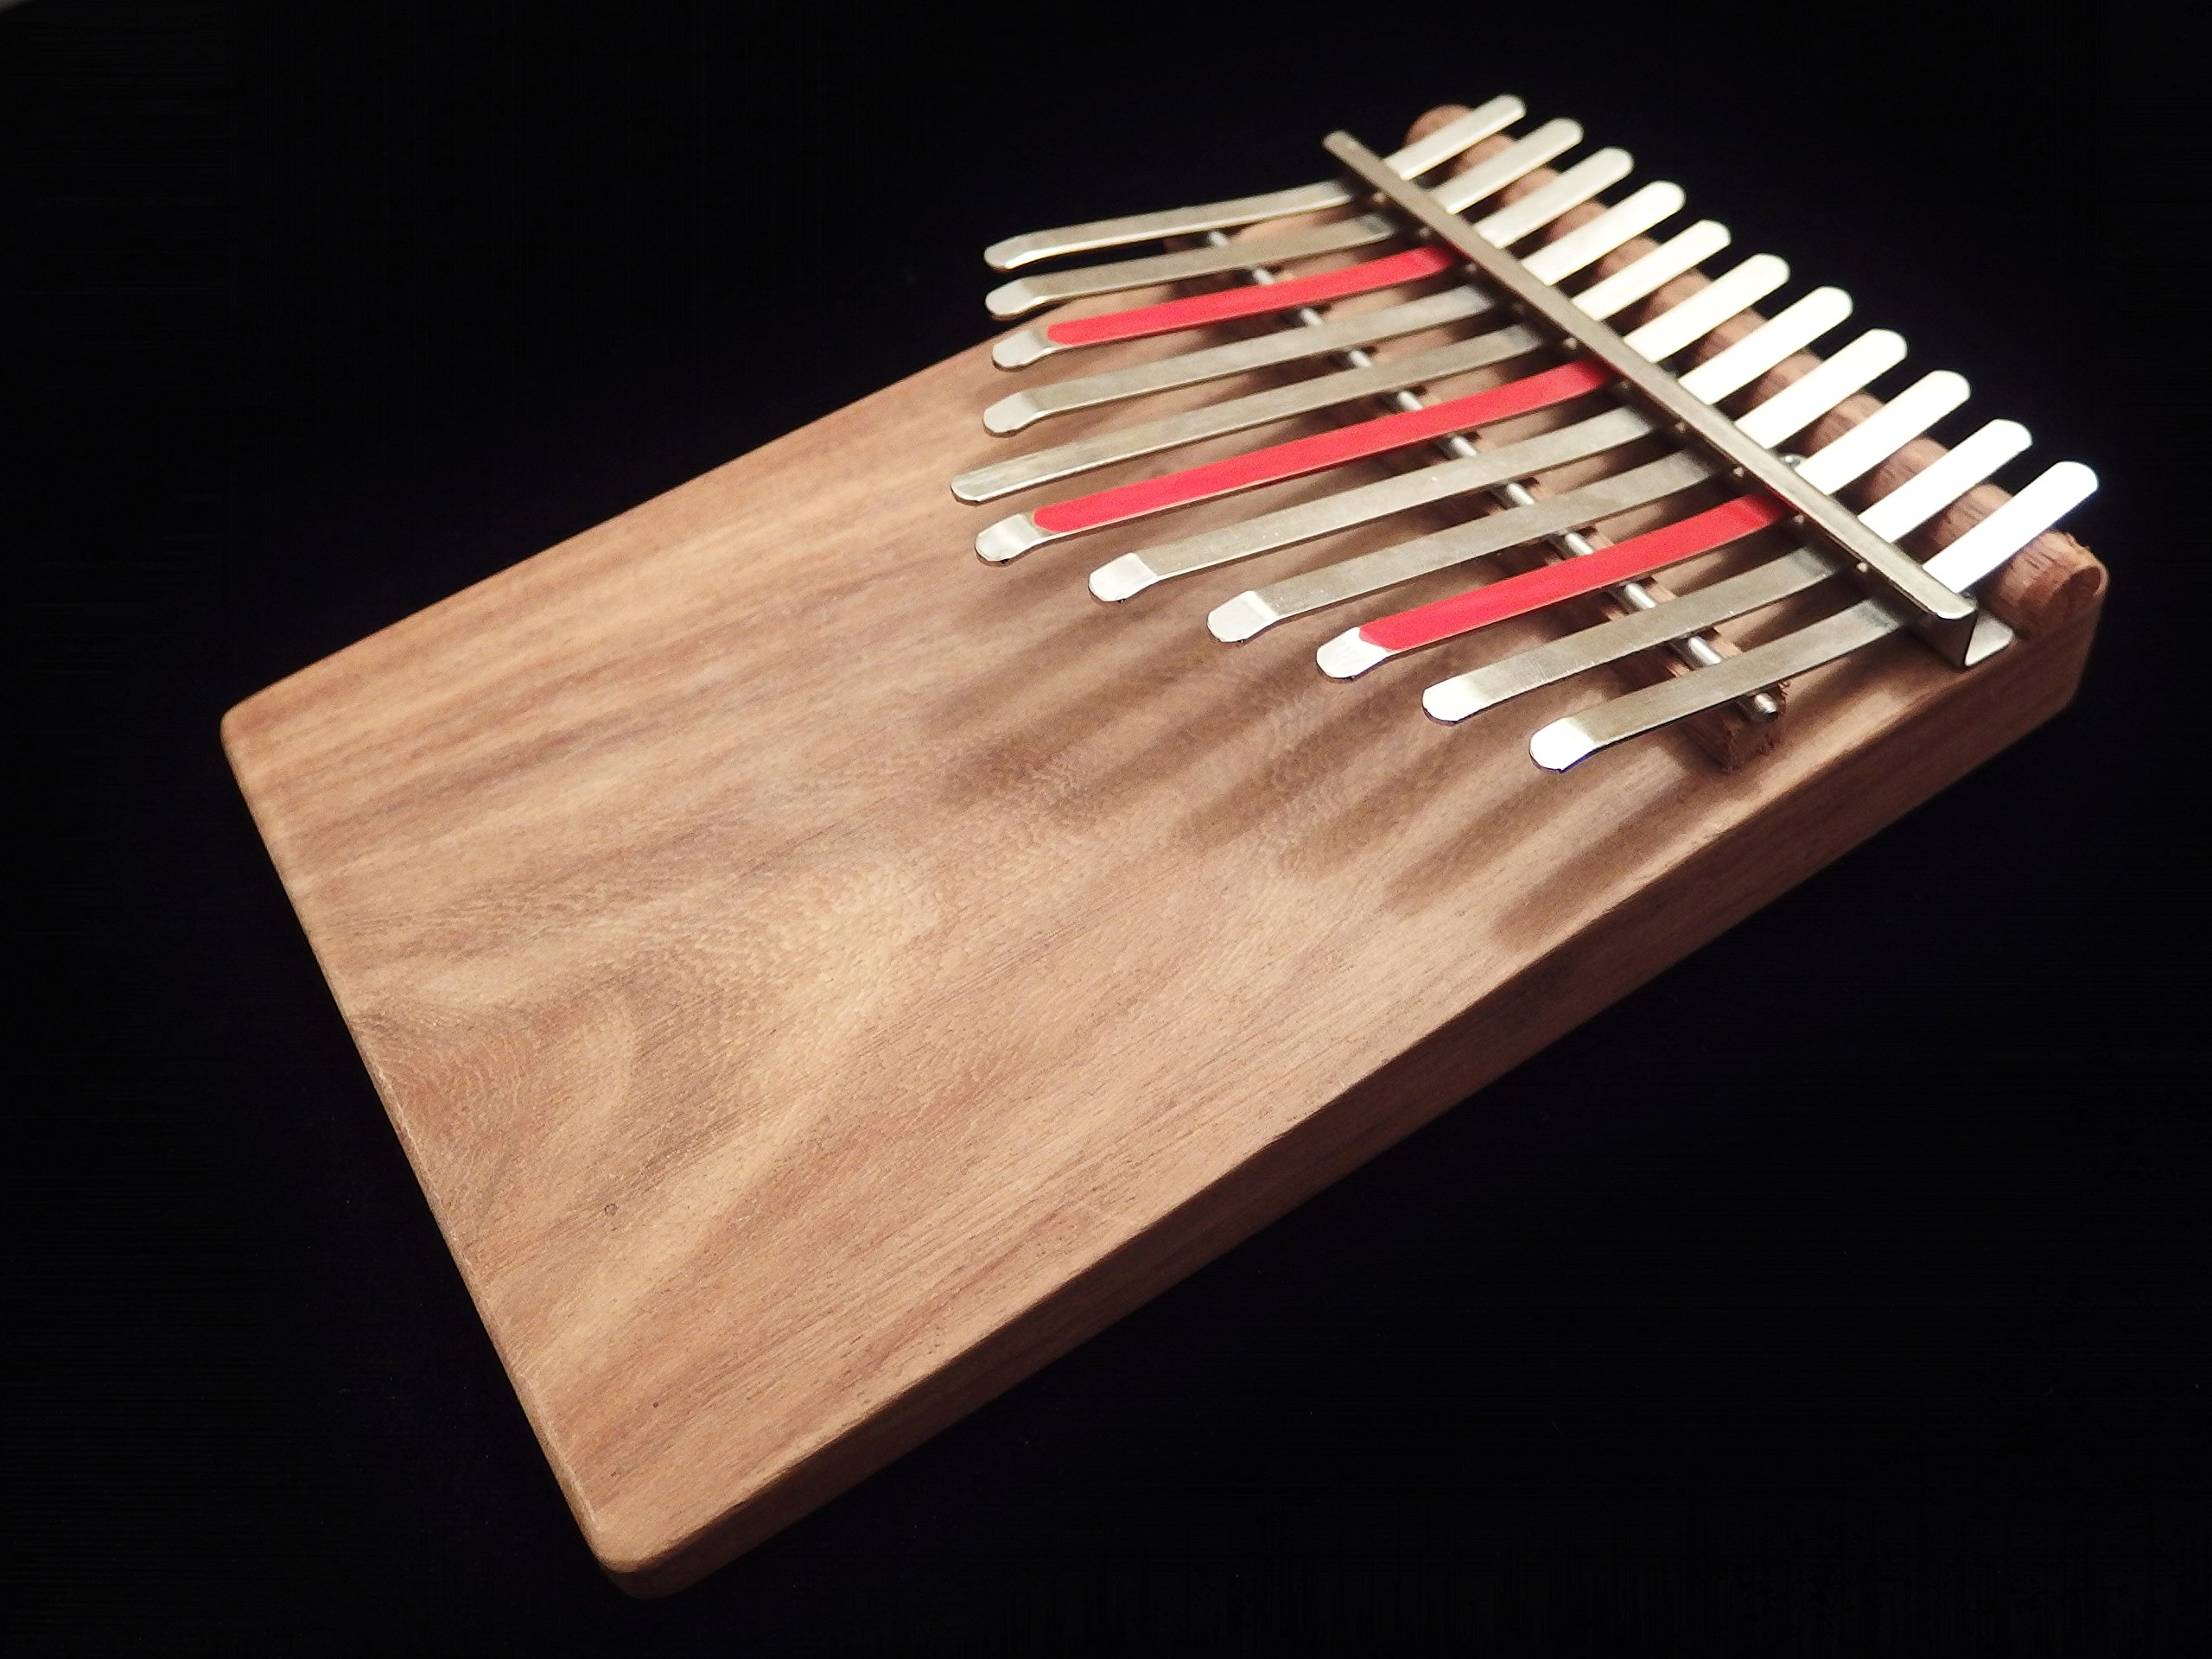 Kalimba Hugh Tracey Celeste 11 Pentatonic Sansula Thumb Piano Great sound by Hugh Tracey